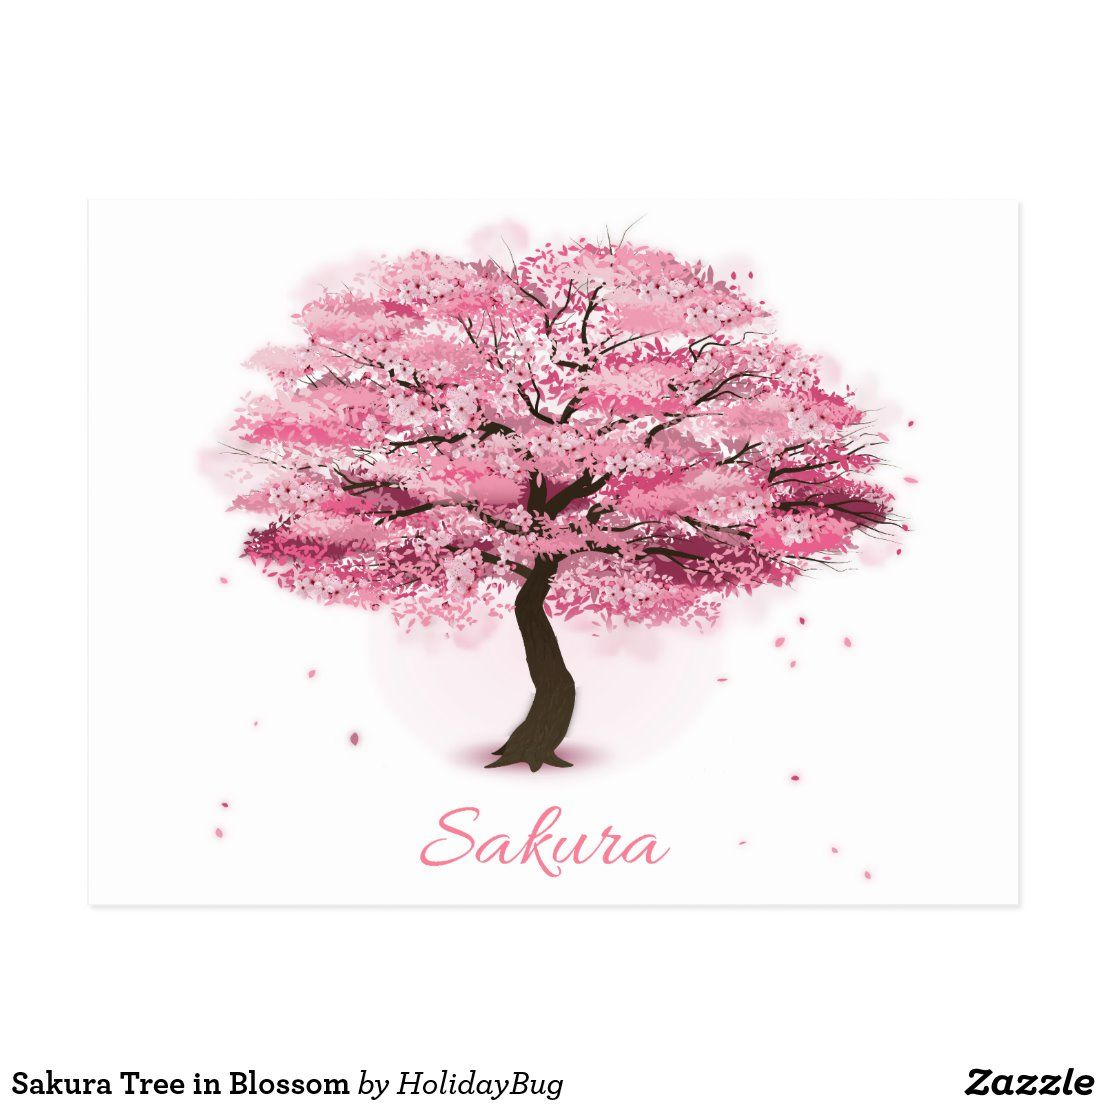 Sakura Tree In Blossom Postcard Zazzle Com In 2021 Cherry Blossom Drawing Cherry Blossom Tree Tattoo Cherry Blossom Painting